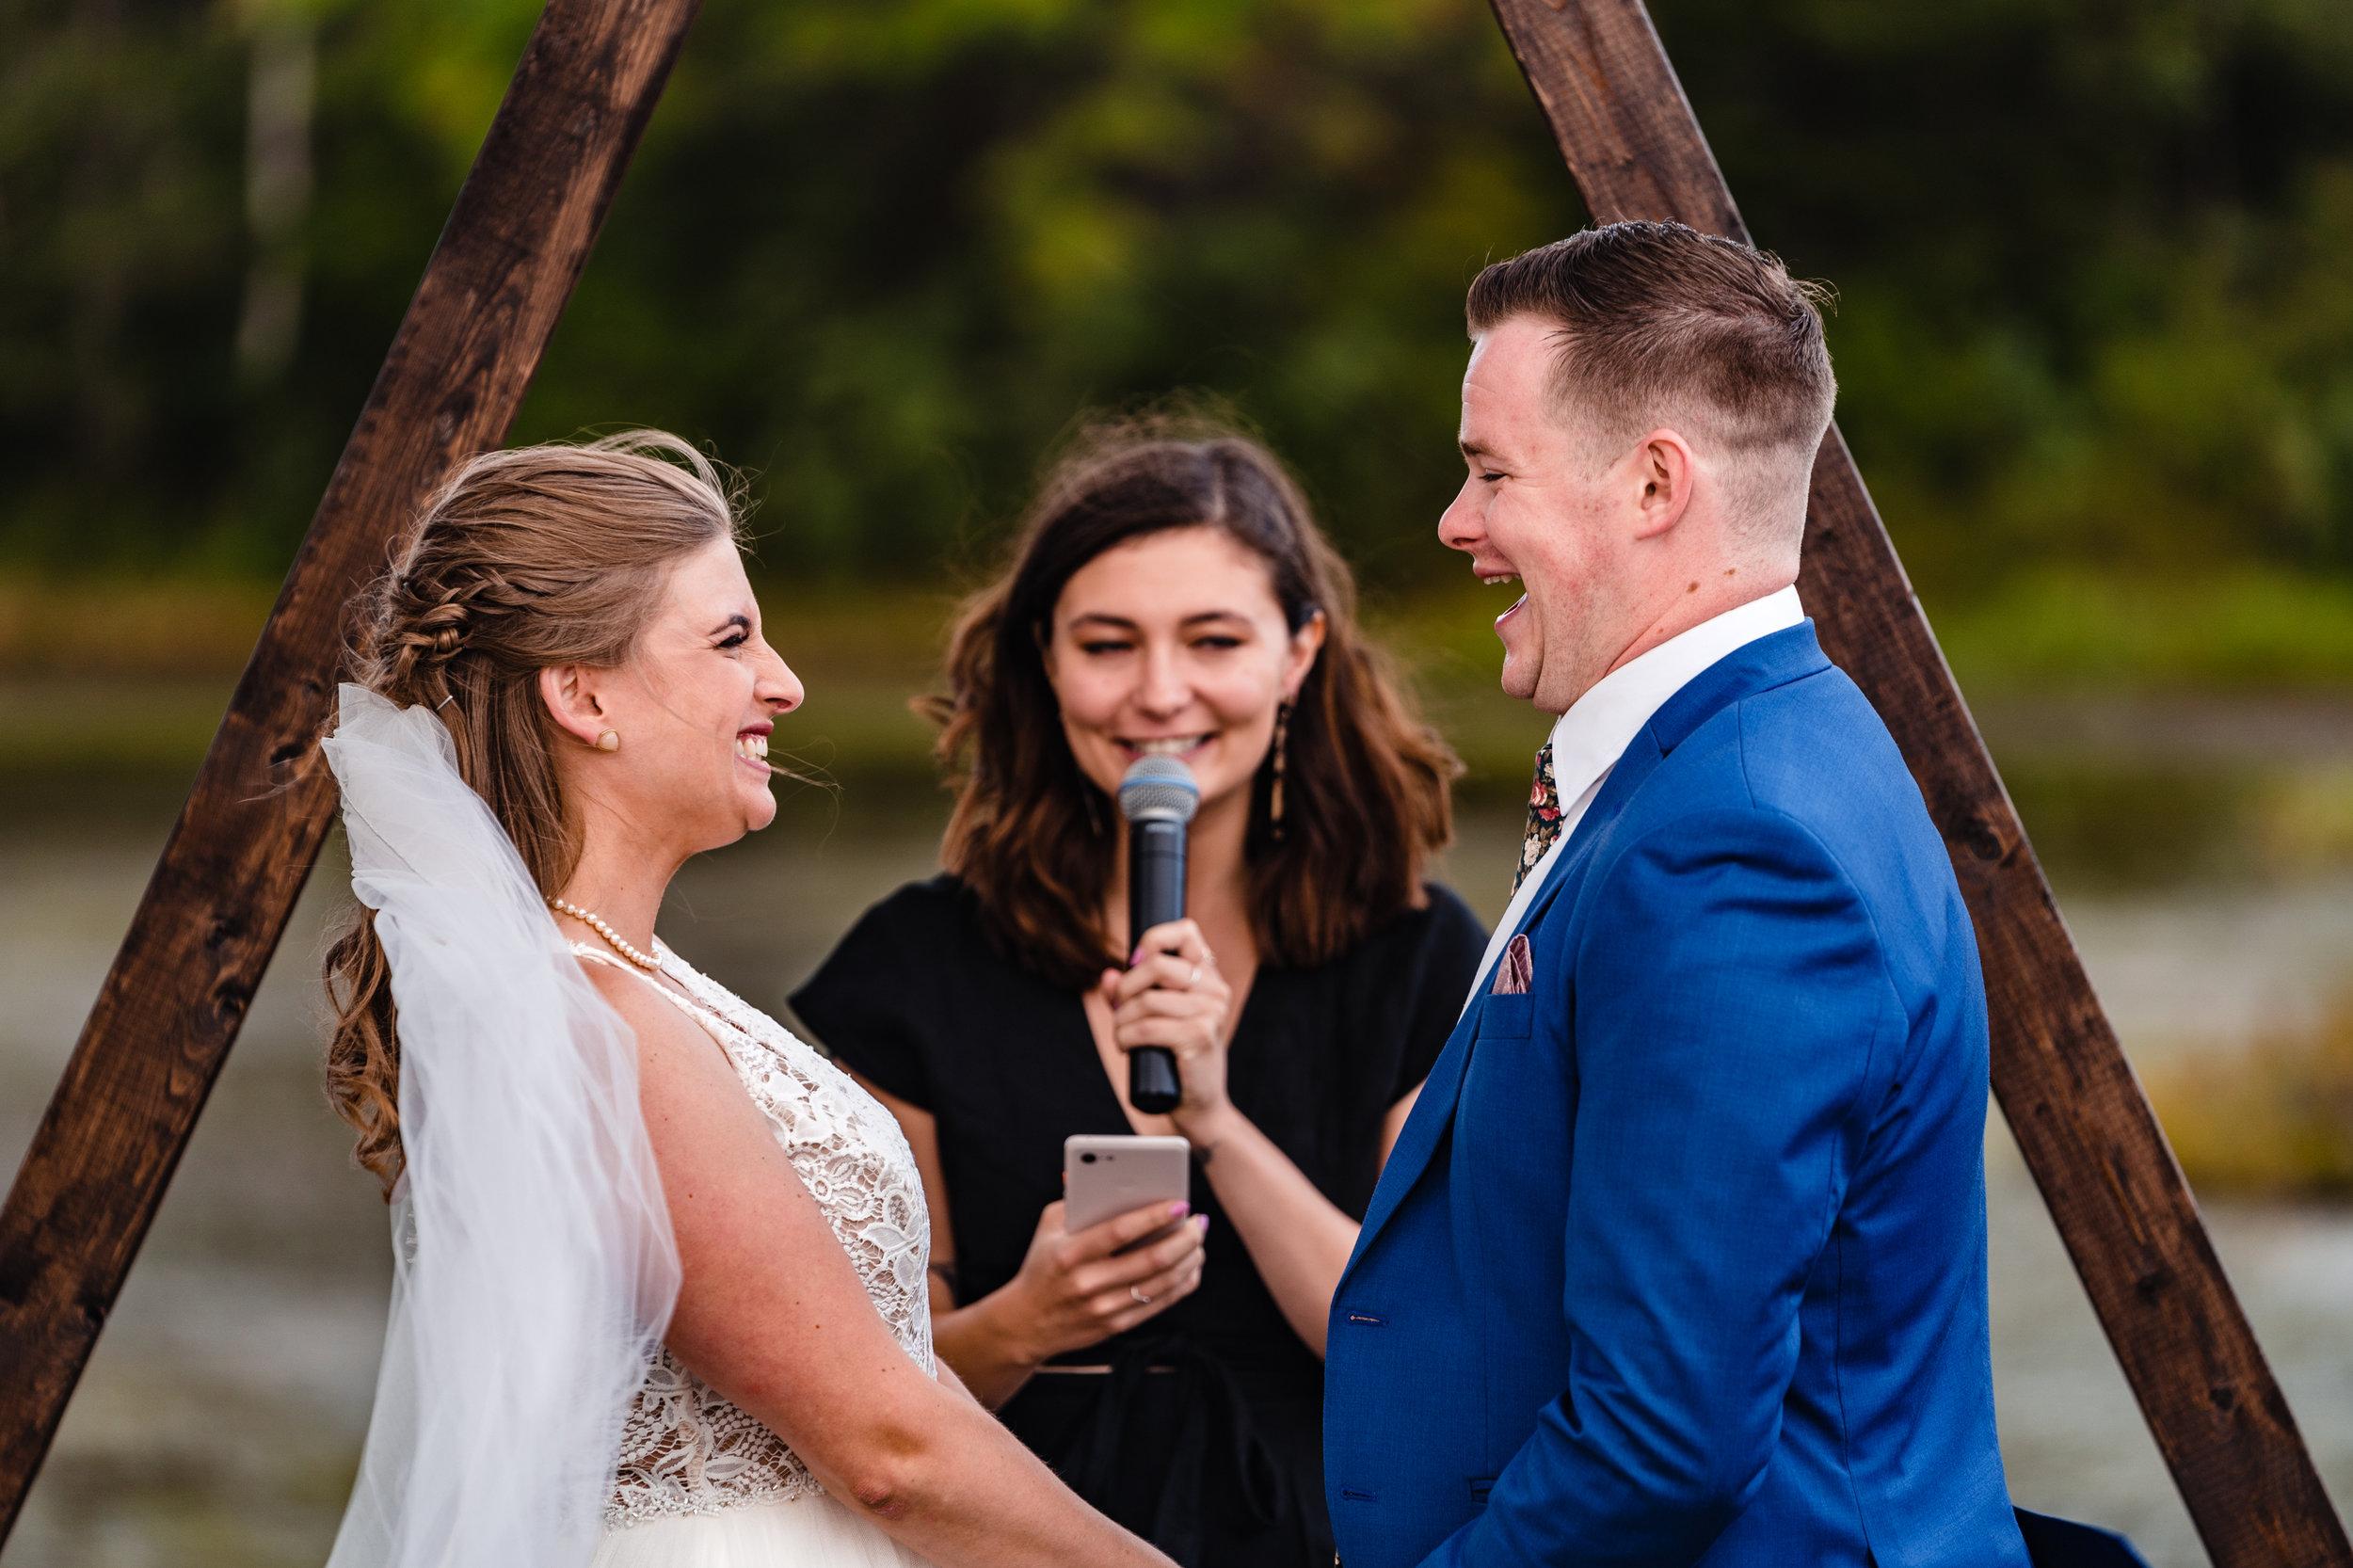 Janelle-Mitch-Halifax-Wedding-Nova-Scotia-Photography (125 of 163).jpg